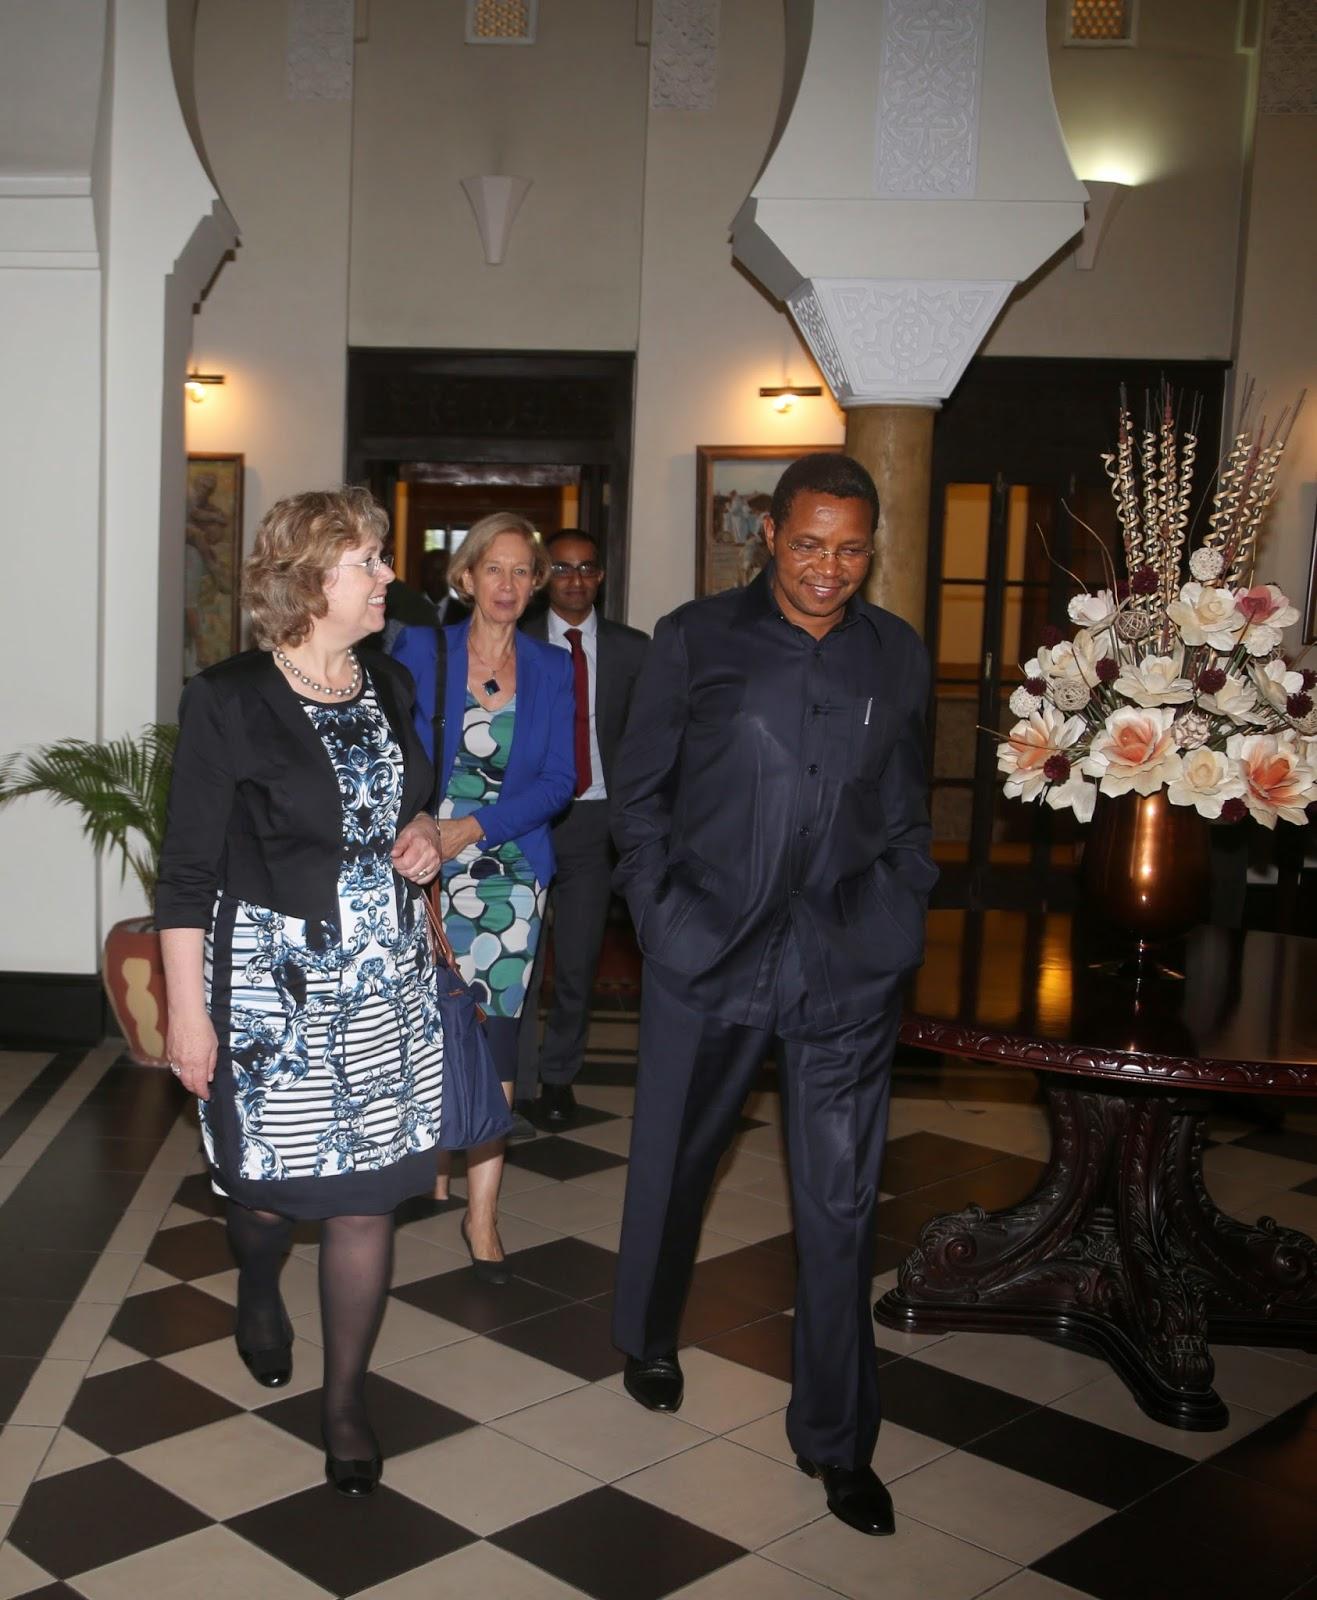 President Jakaya Mrisho Kikwete Escorts Ms Baronese Lindsay Northover Uks Parliamentary Under Secretary Of State For International Development After